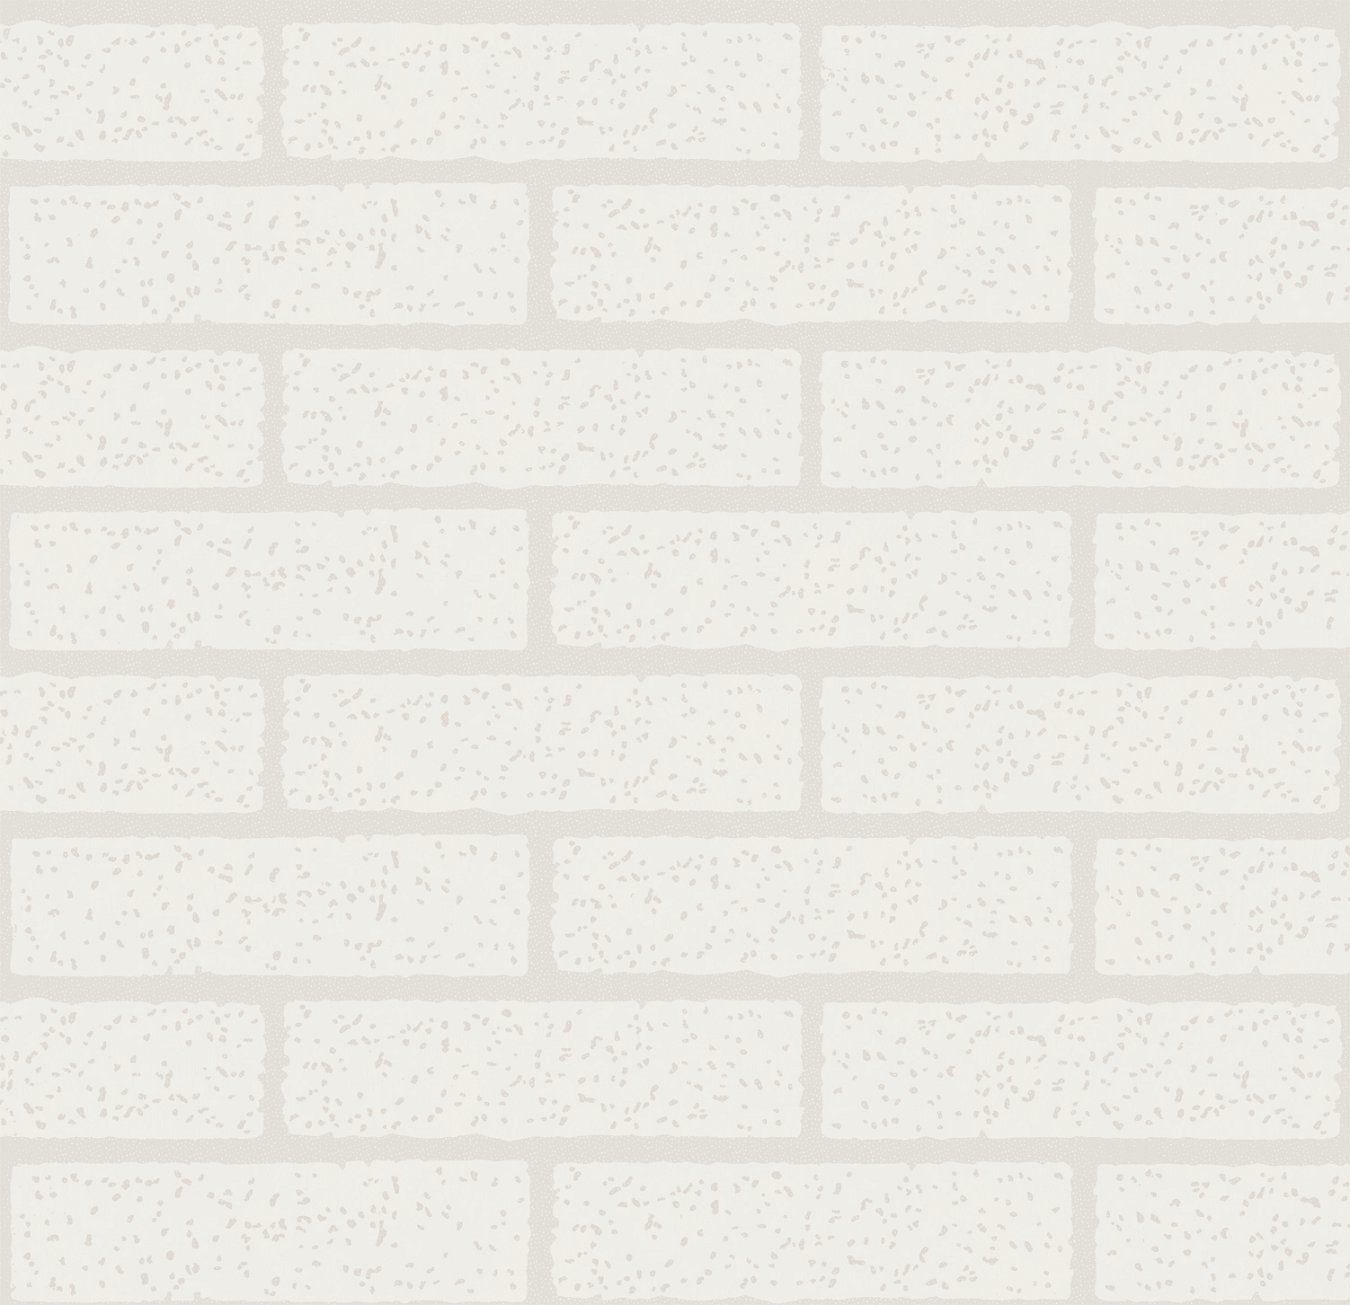 Papel de Parede Kan Tai Vinílico Coleção Neonature 5 Tijolo Branco, Rejunte cinza